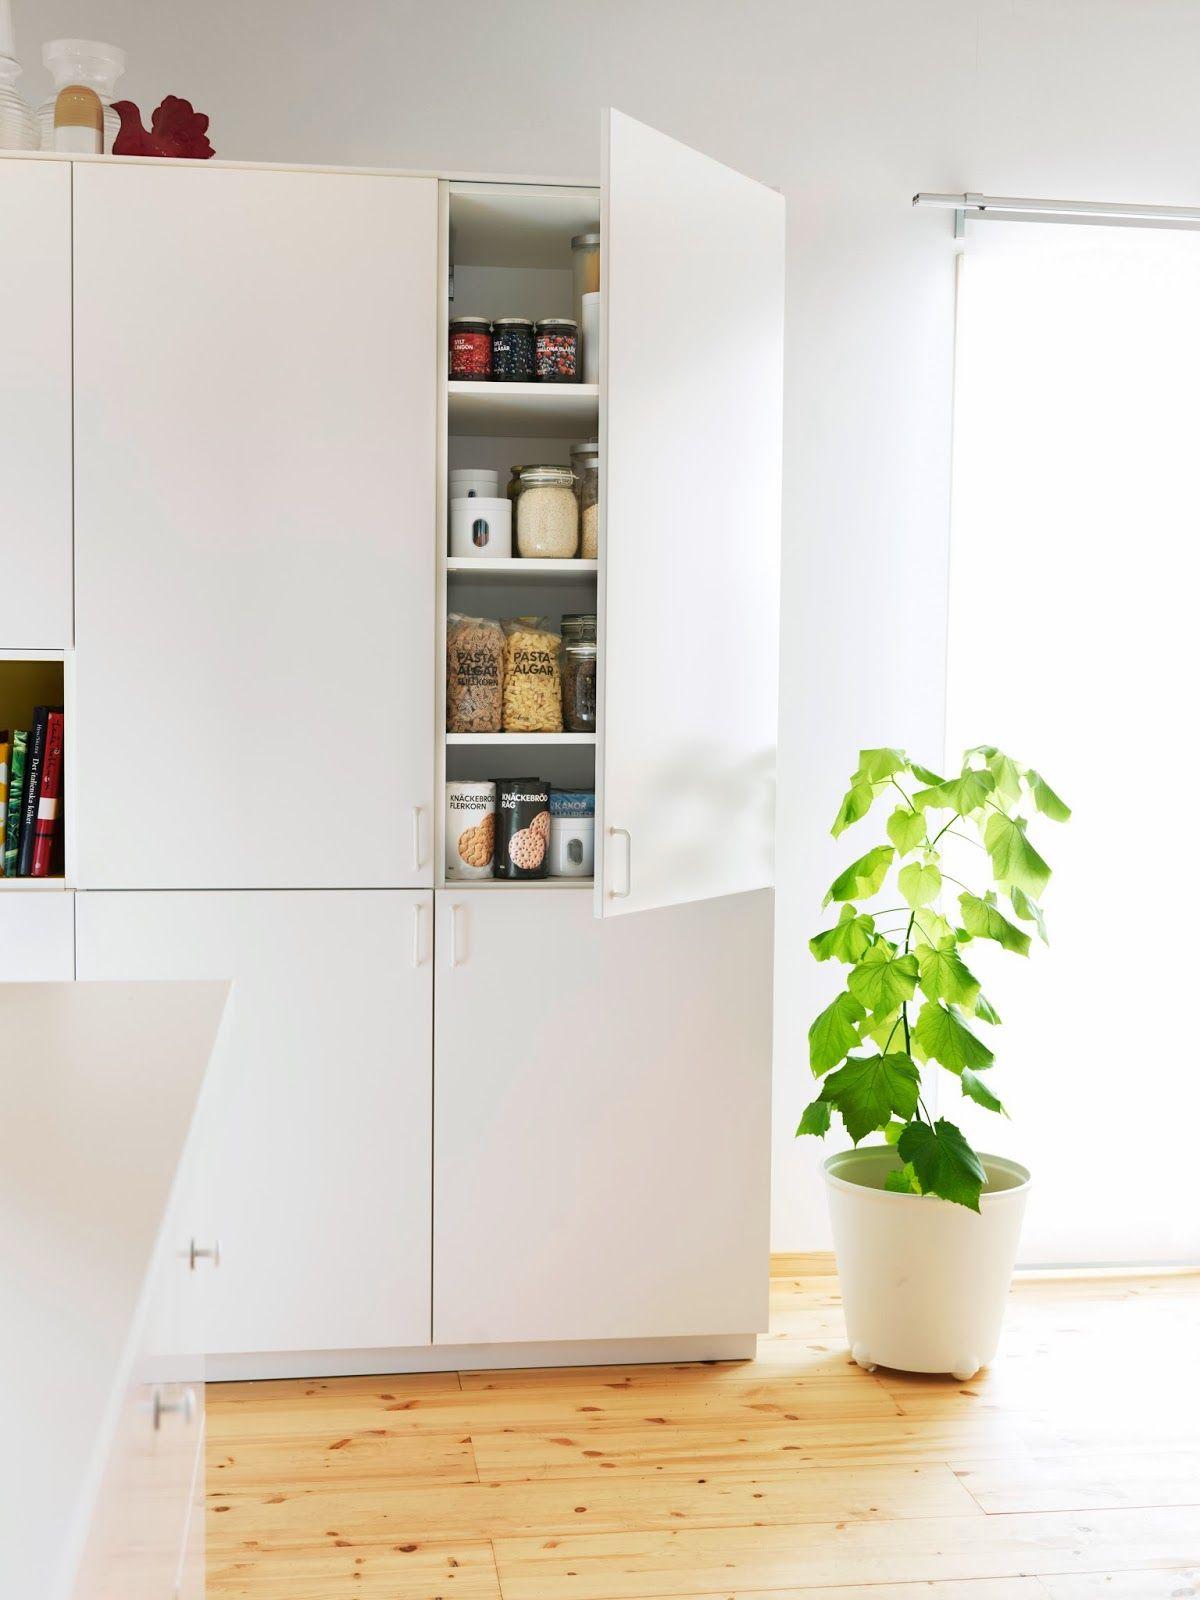 METOD, las nuevas cocinas de IKEA  Ikea ideeën, Keukens, Ikea